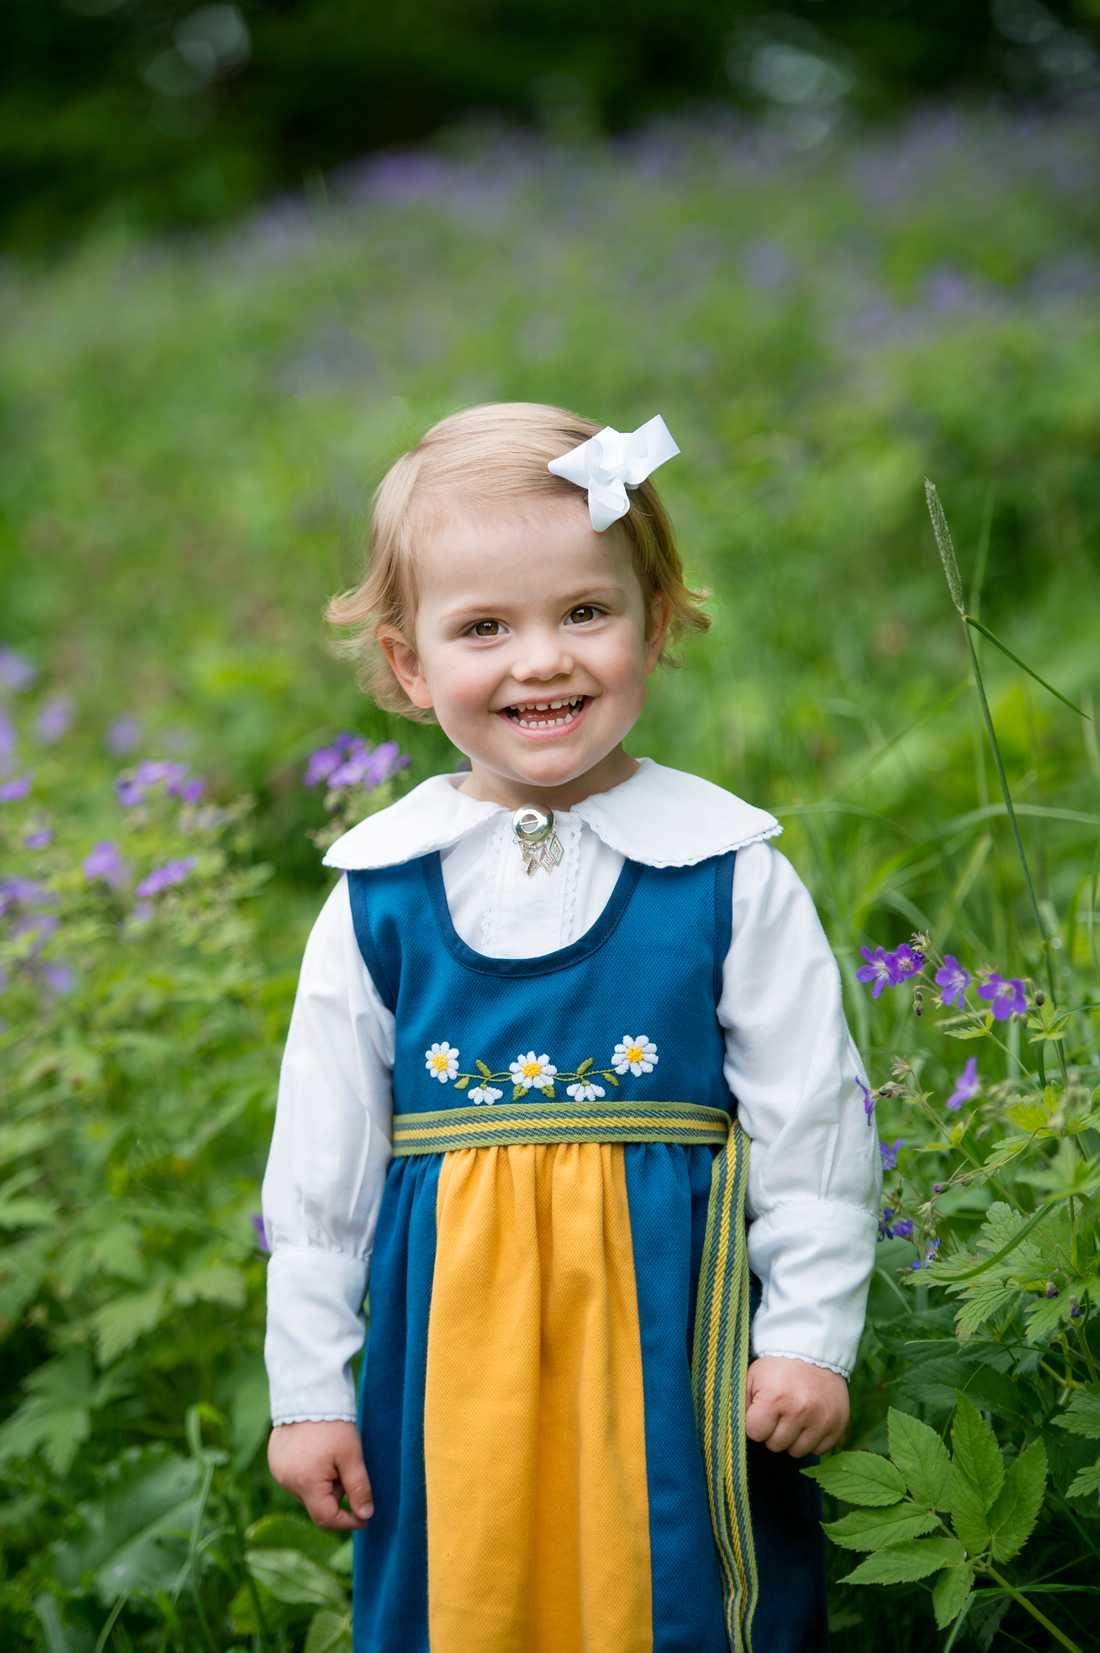 Prinsessan Estelle 2014.